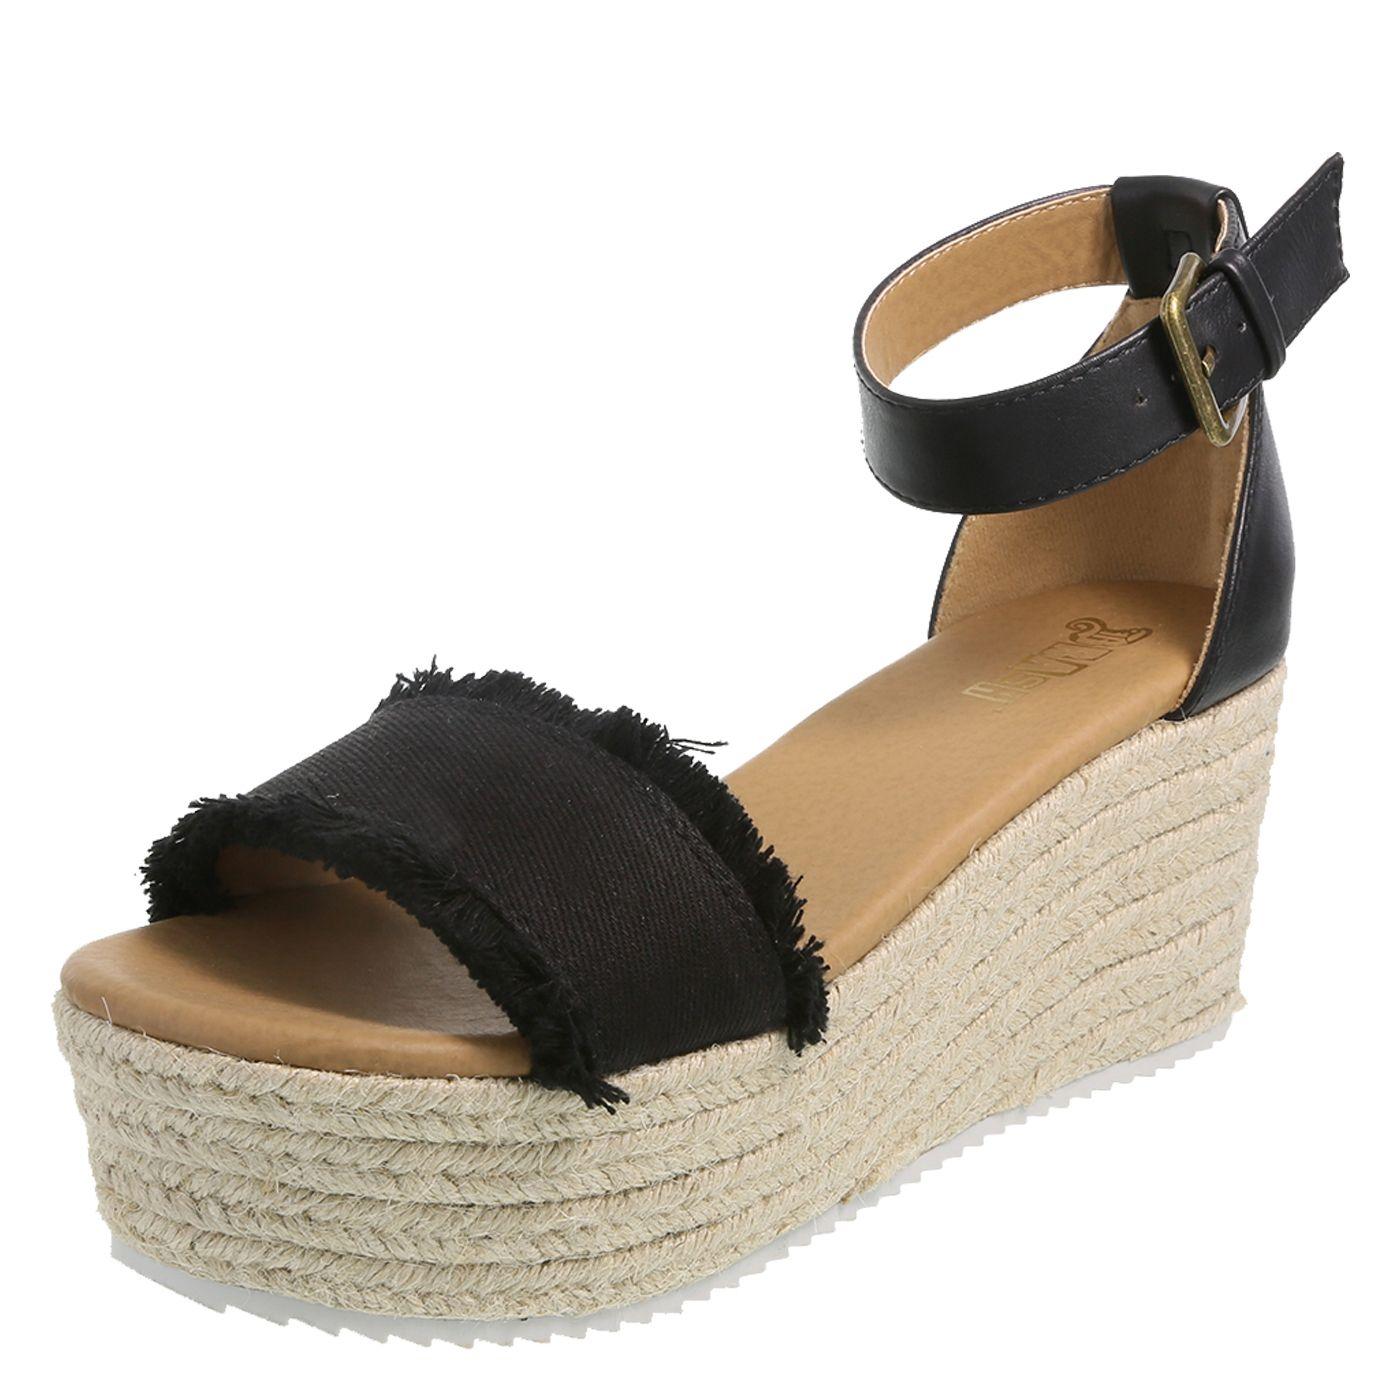 dc1d67e4f47 Brash Tessa Women s Platform Wedge Sandal Shoe